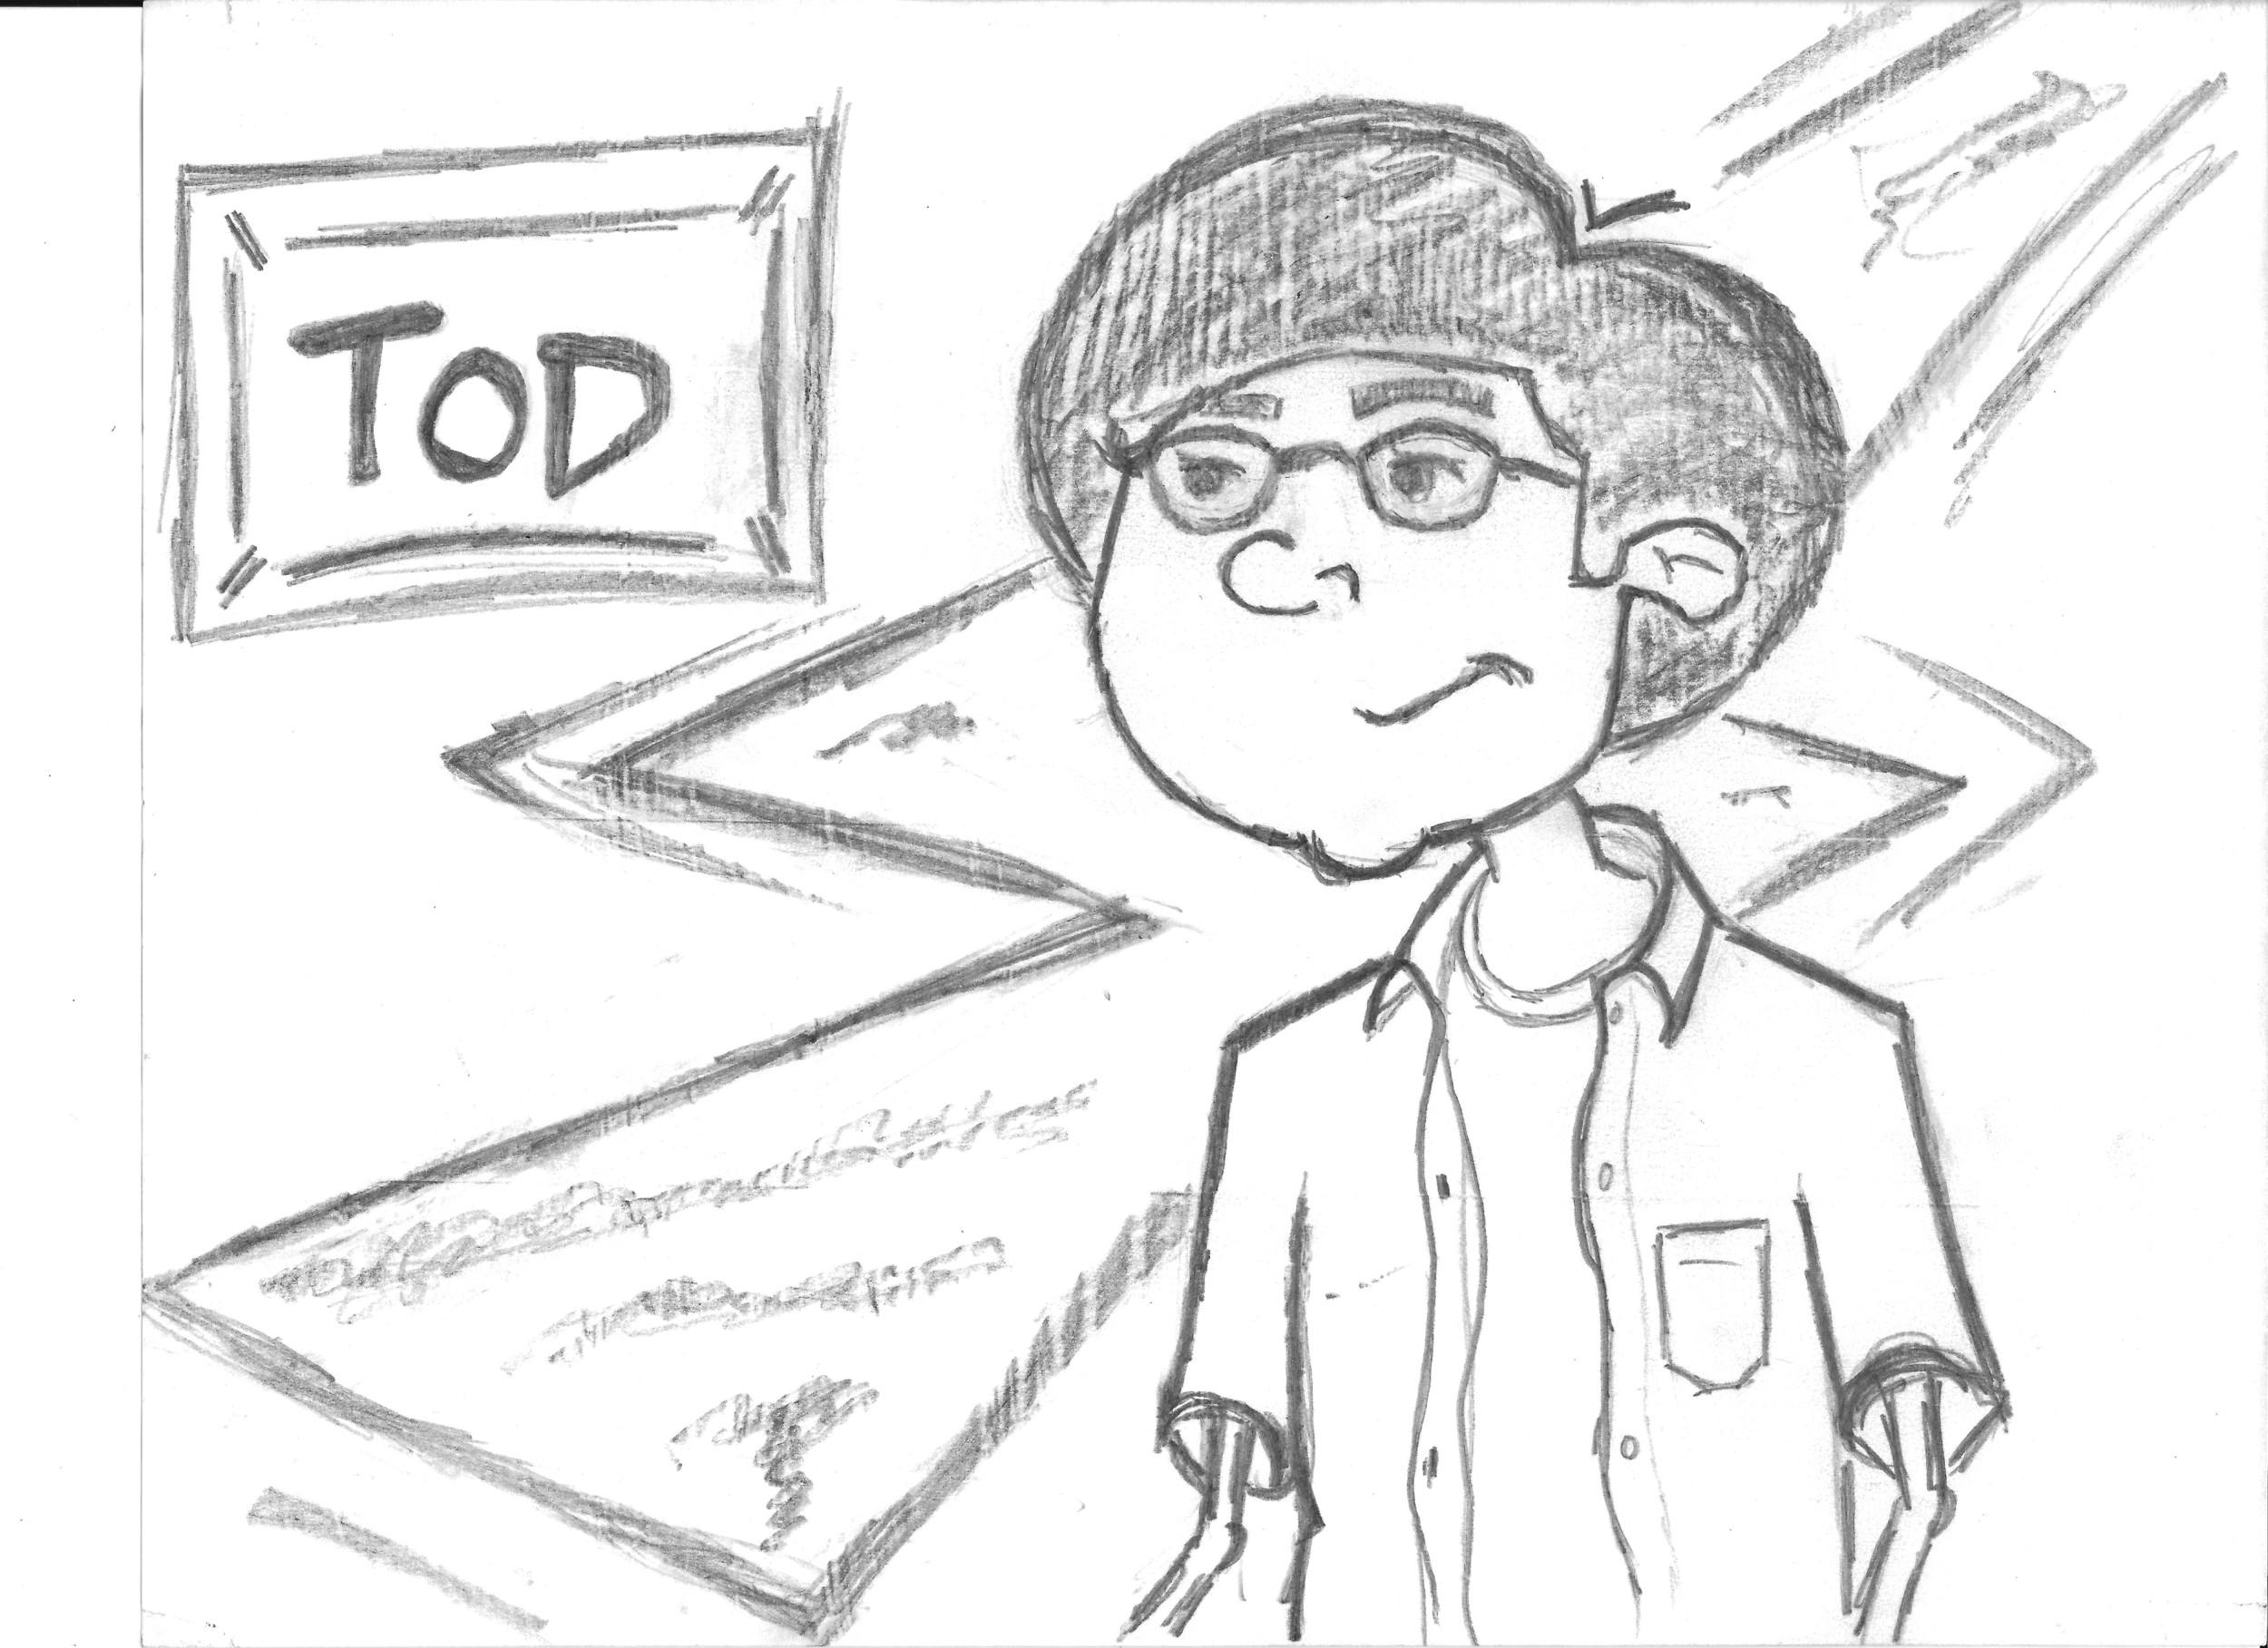 rod_tod_concept.jpg